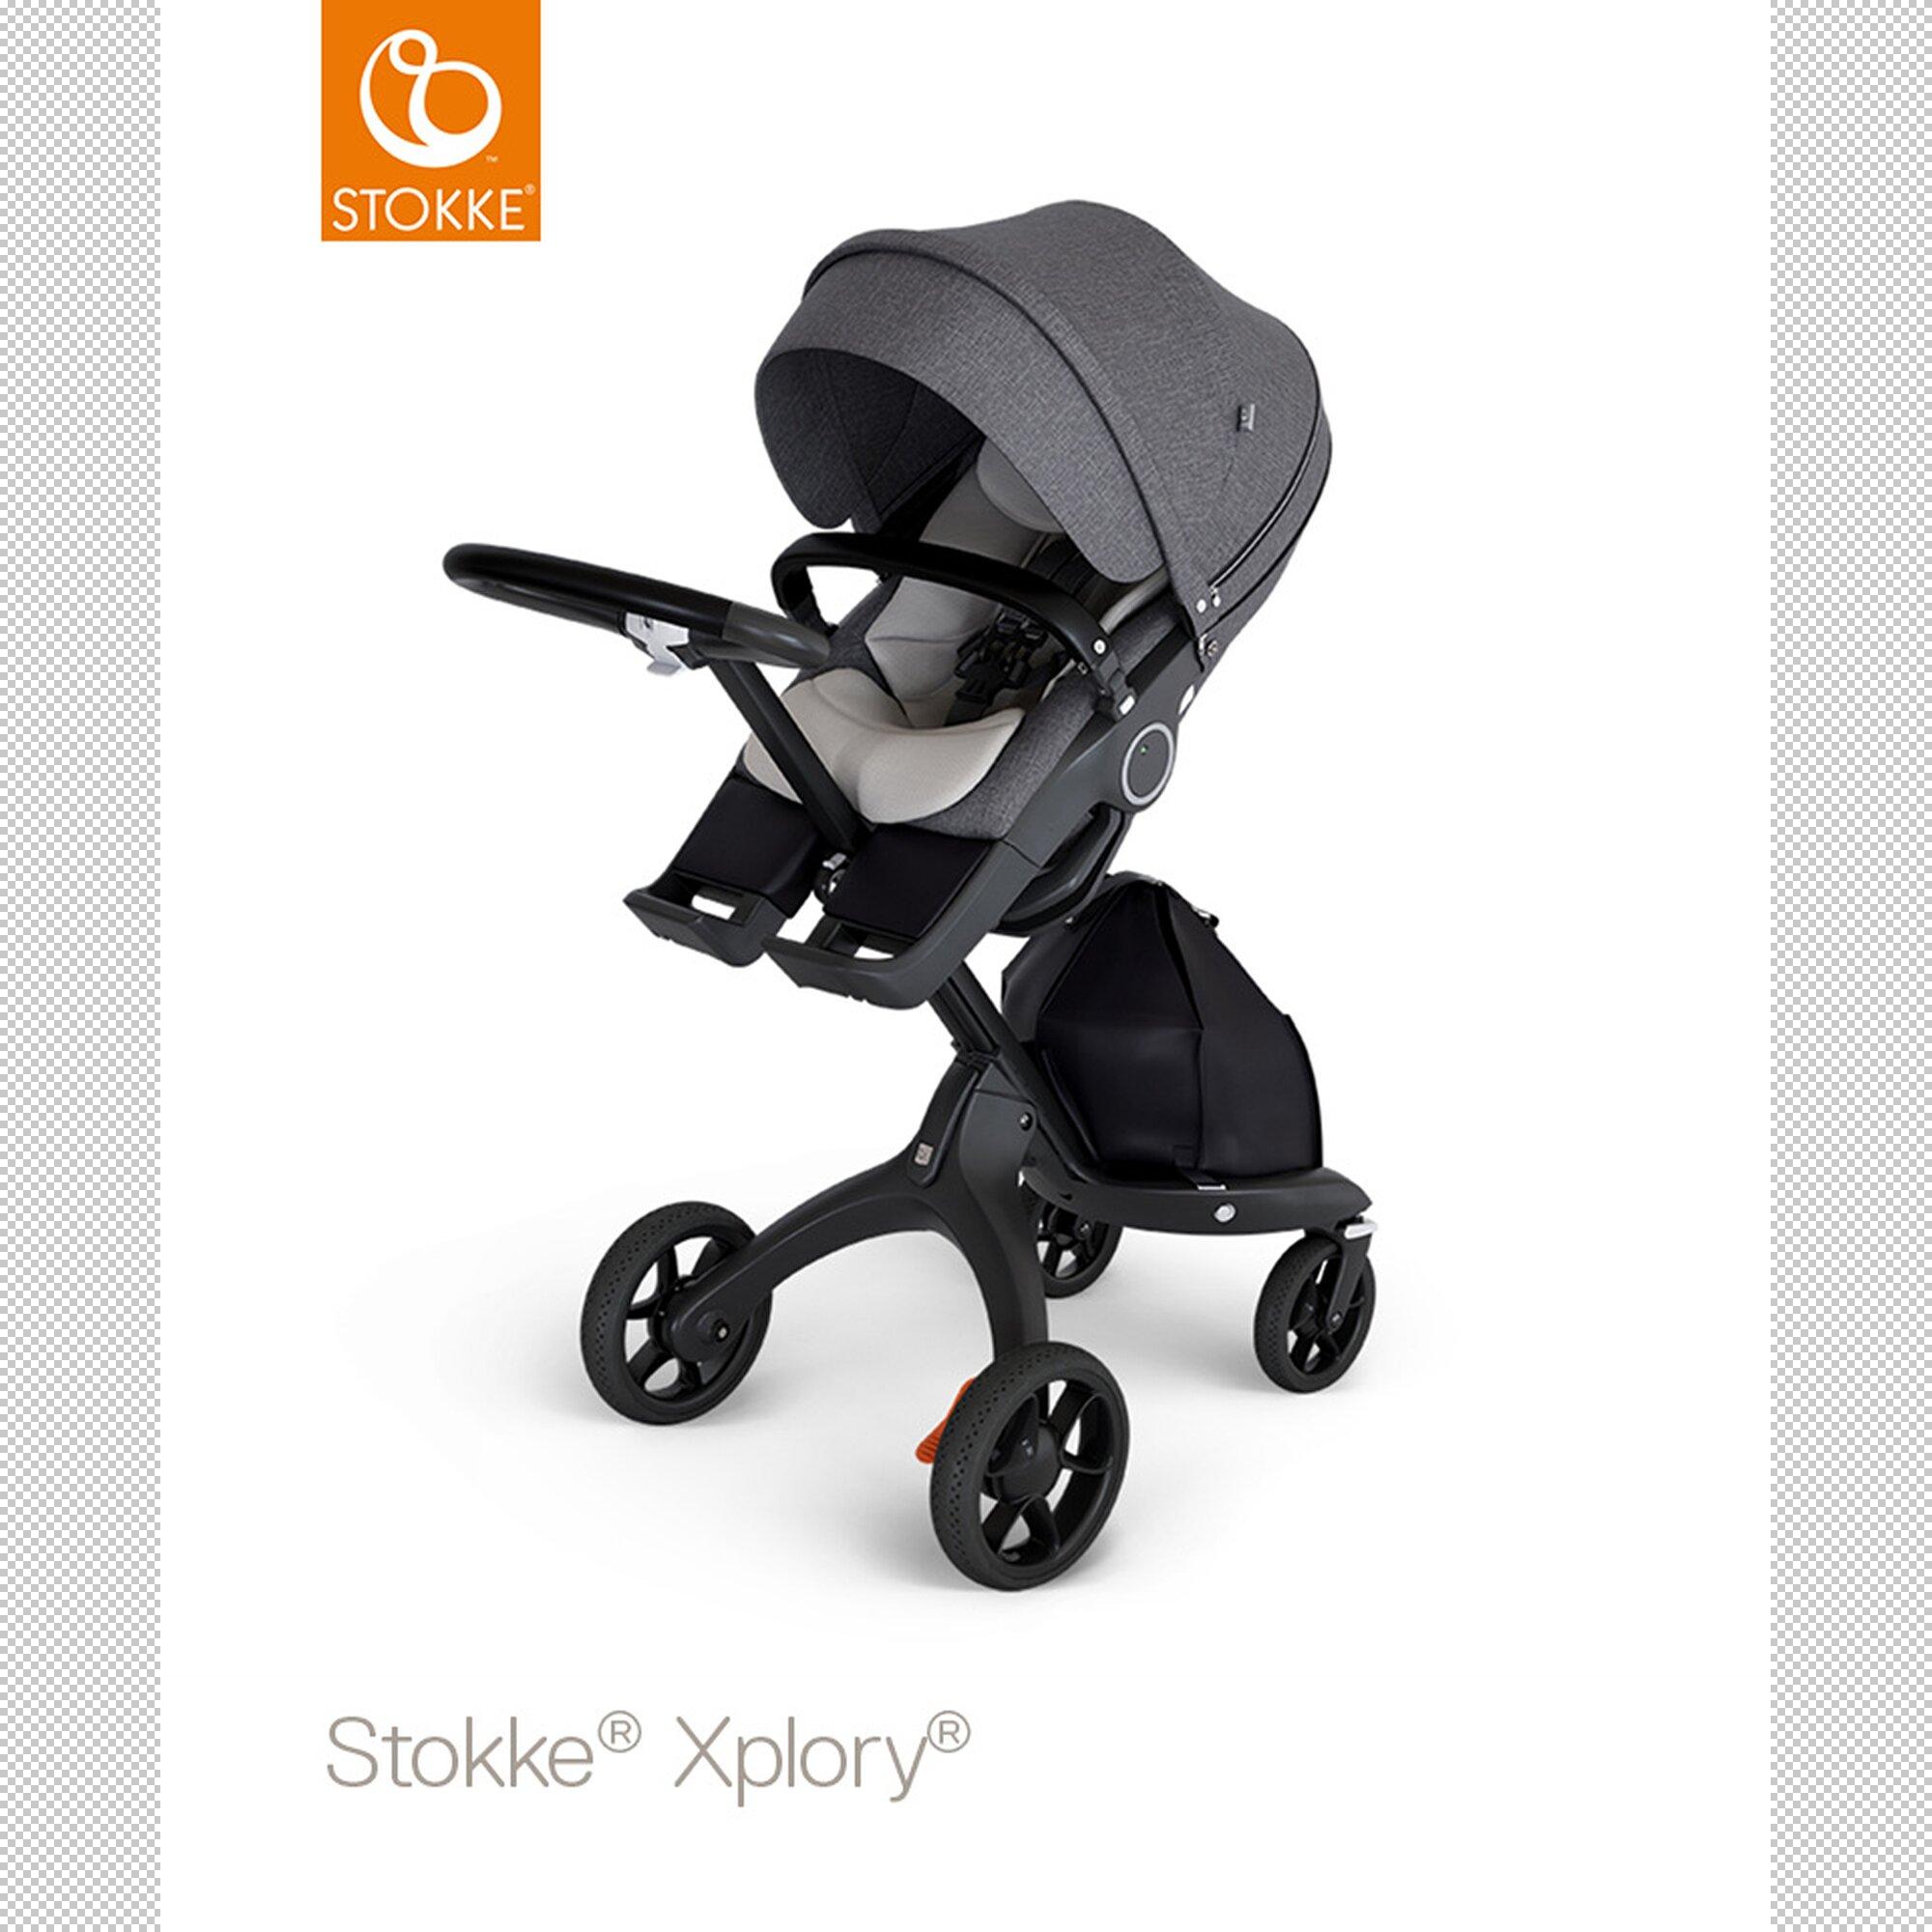 stokke-neugeborenen-einlage-fur-kinderwagen-xplory-v6-trailz-grau